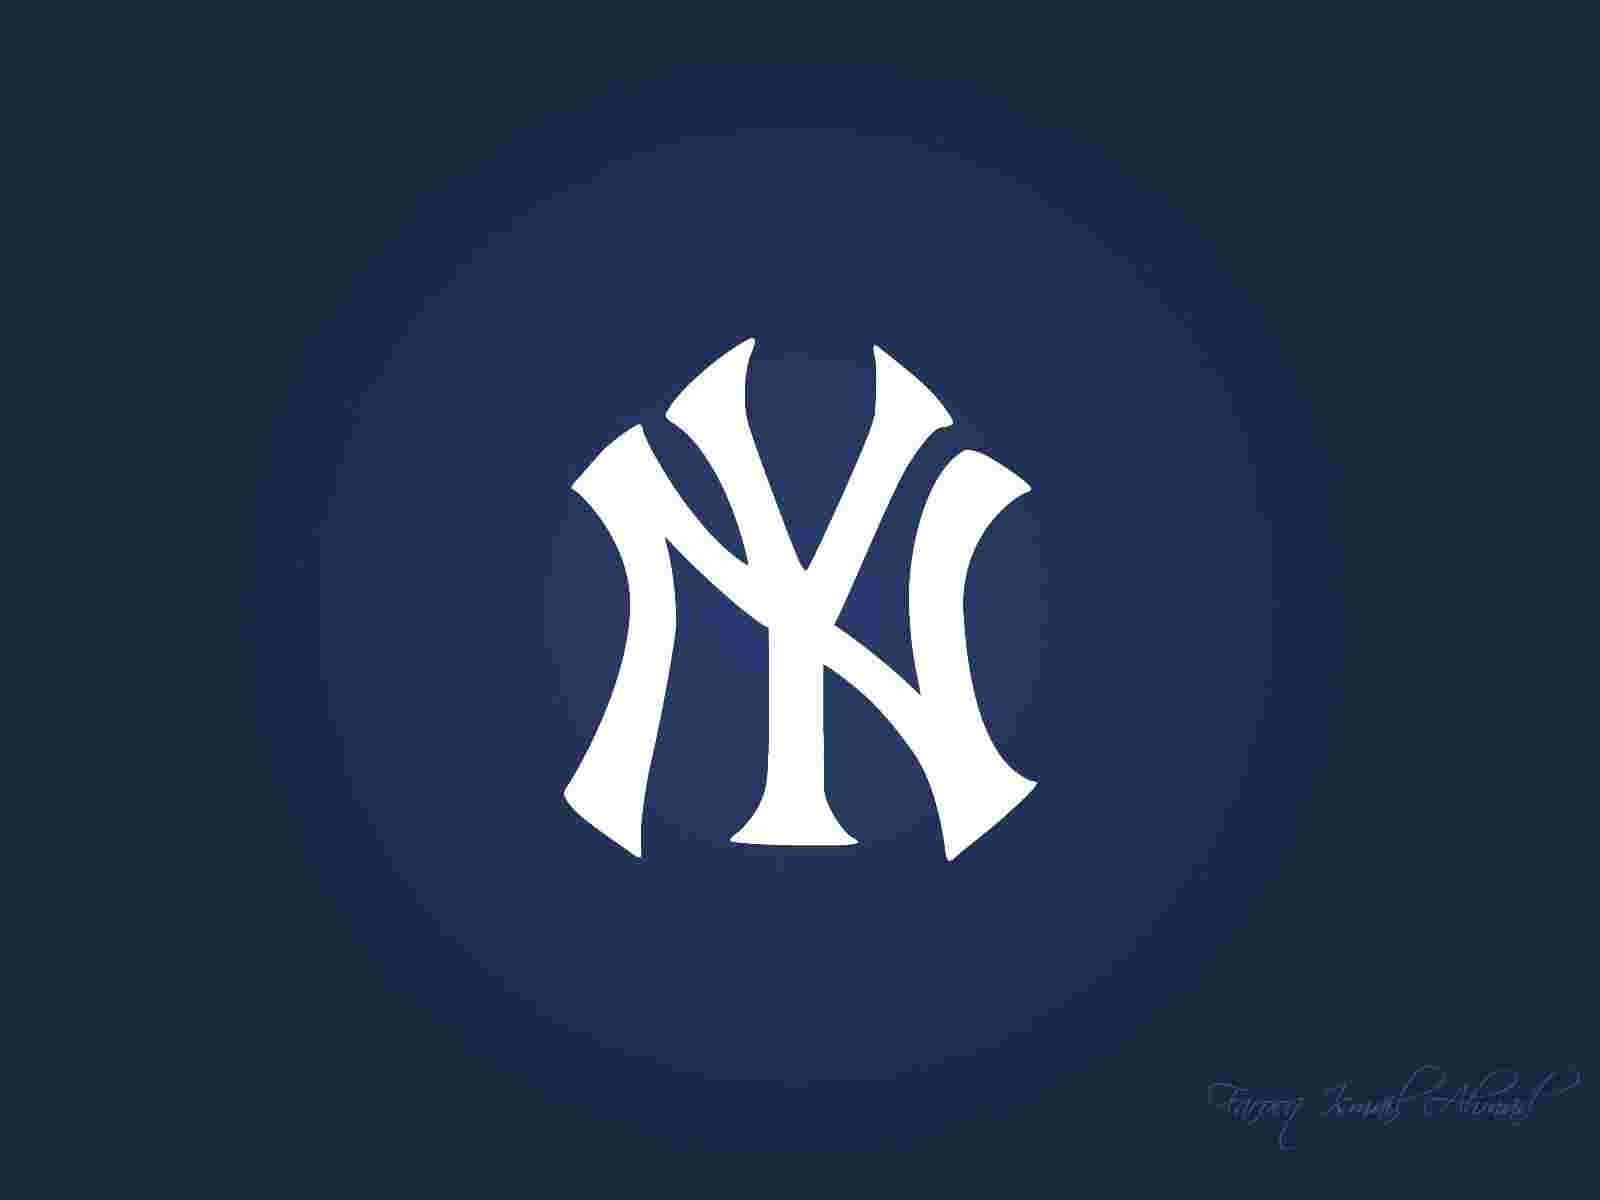 New York Yankees Wallpapers New York Yankees Background Baseball Wallpaper Ny Mets New York Yankees